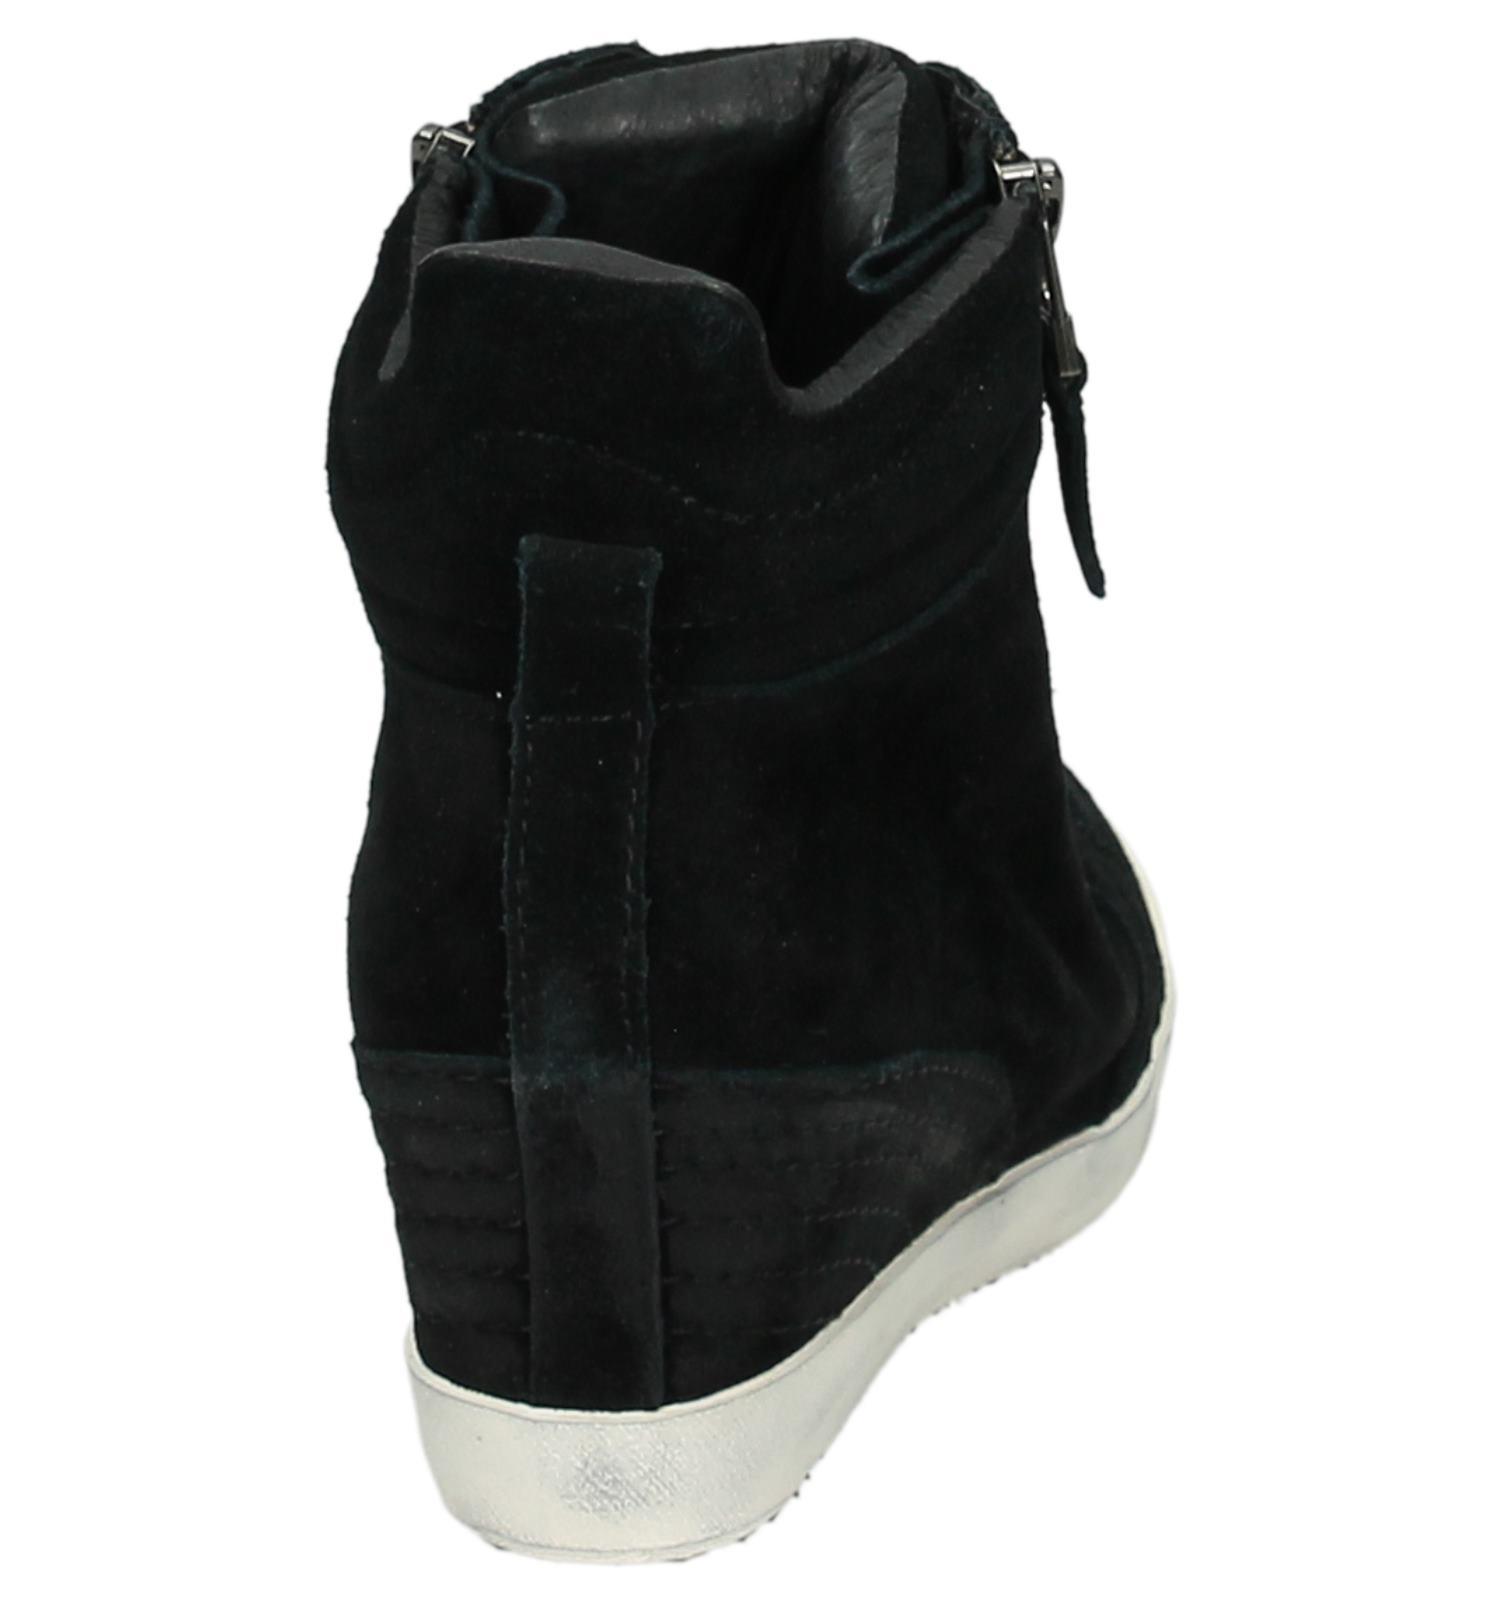 228874b3095 Sneaker met Sleehak Zwart Newblue | TORFS.BE | Gratis verzend en retour